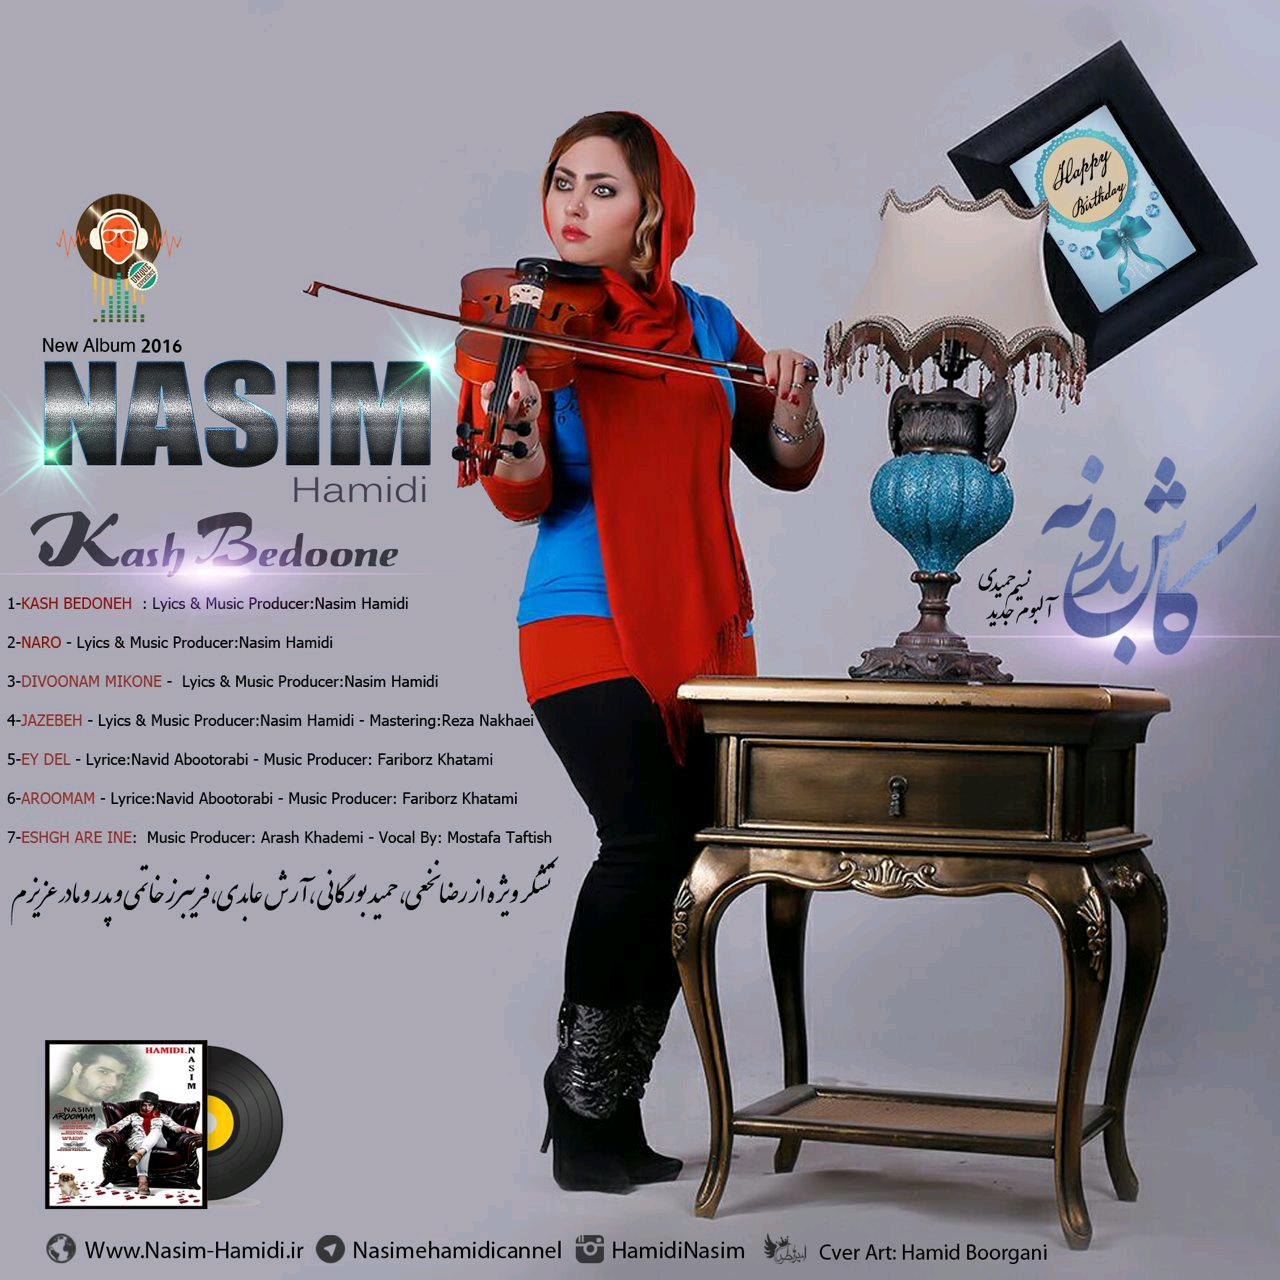 Nasim Hamidi – Kash Bedoone